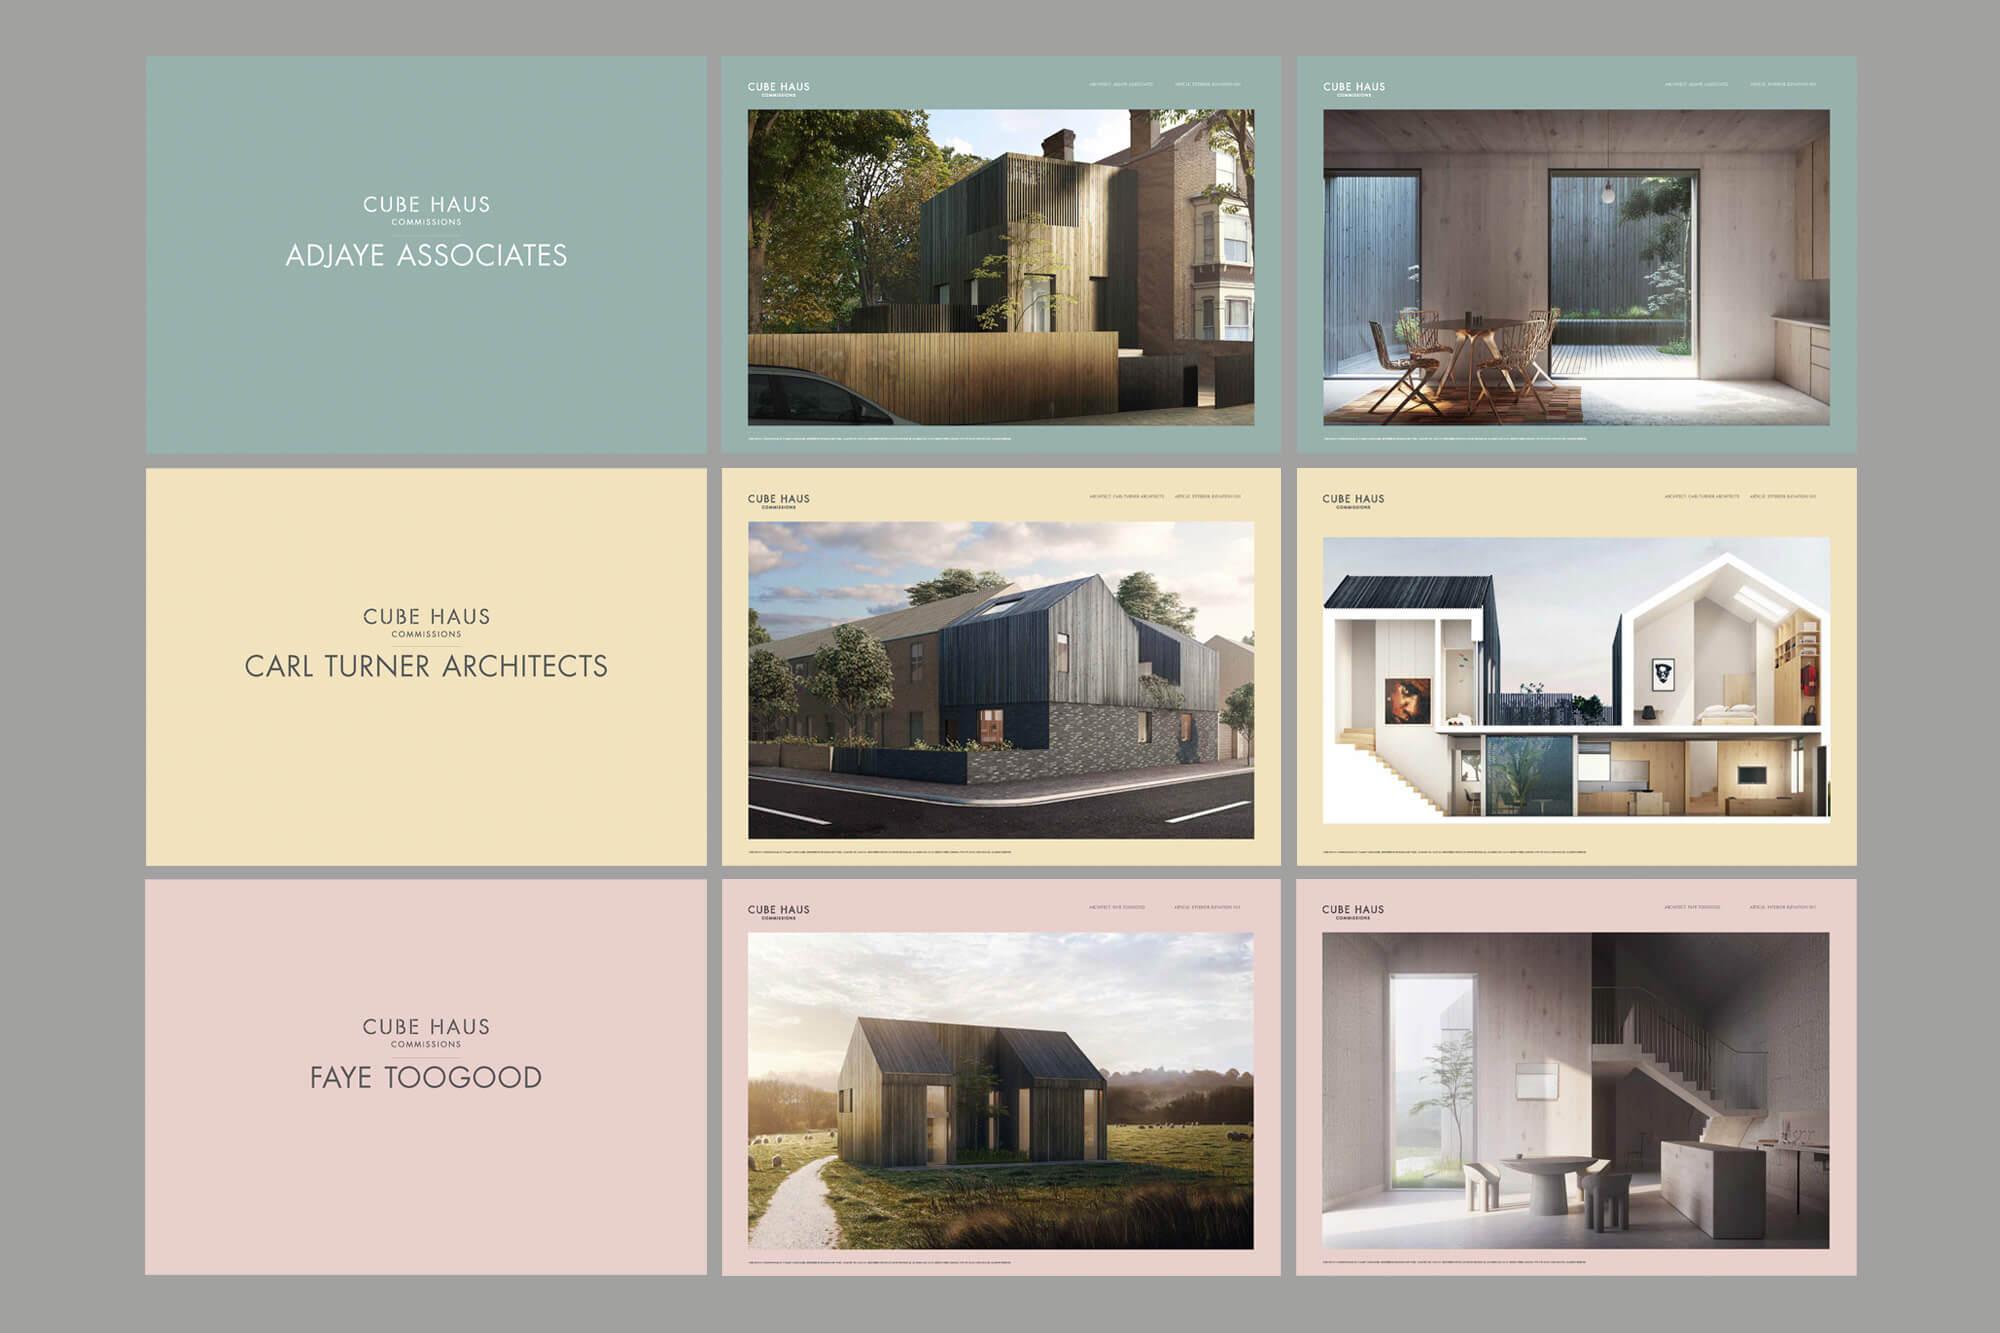 gpj-studio-cube-haus-architects-website-cs-11